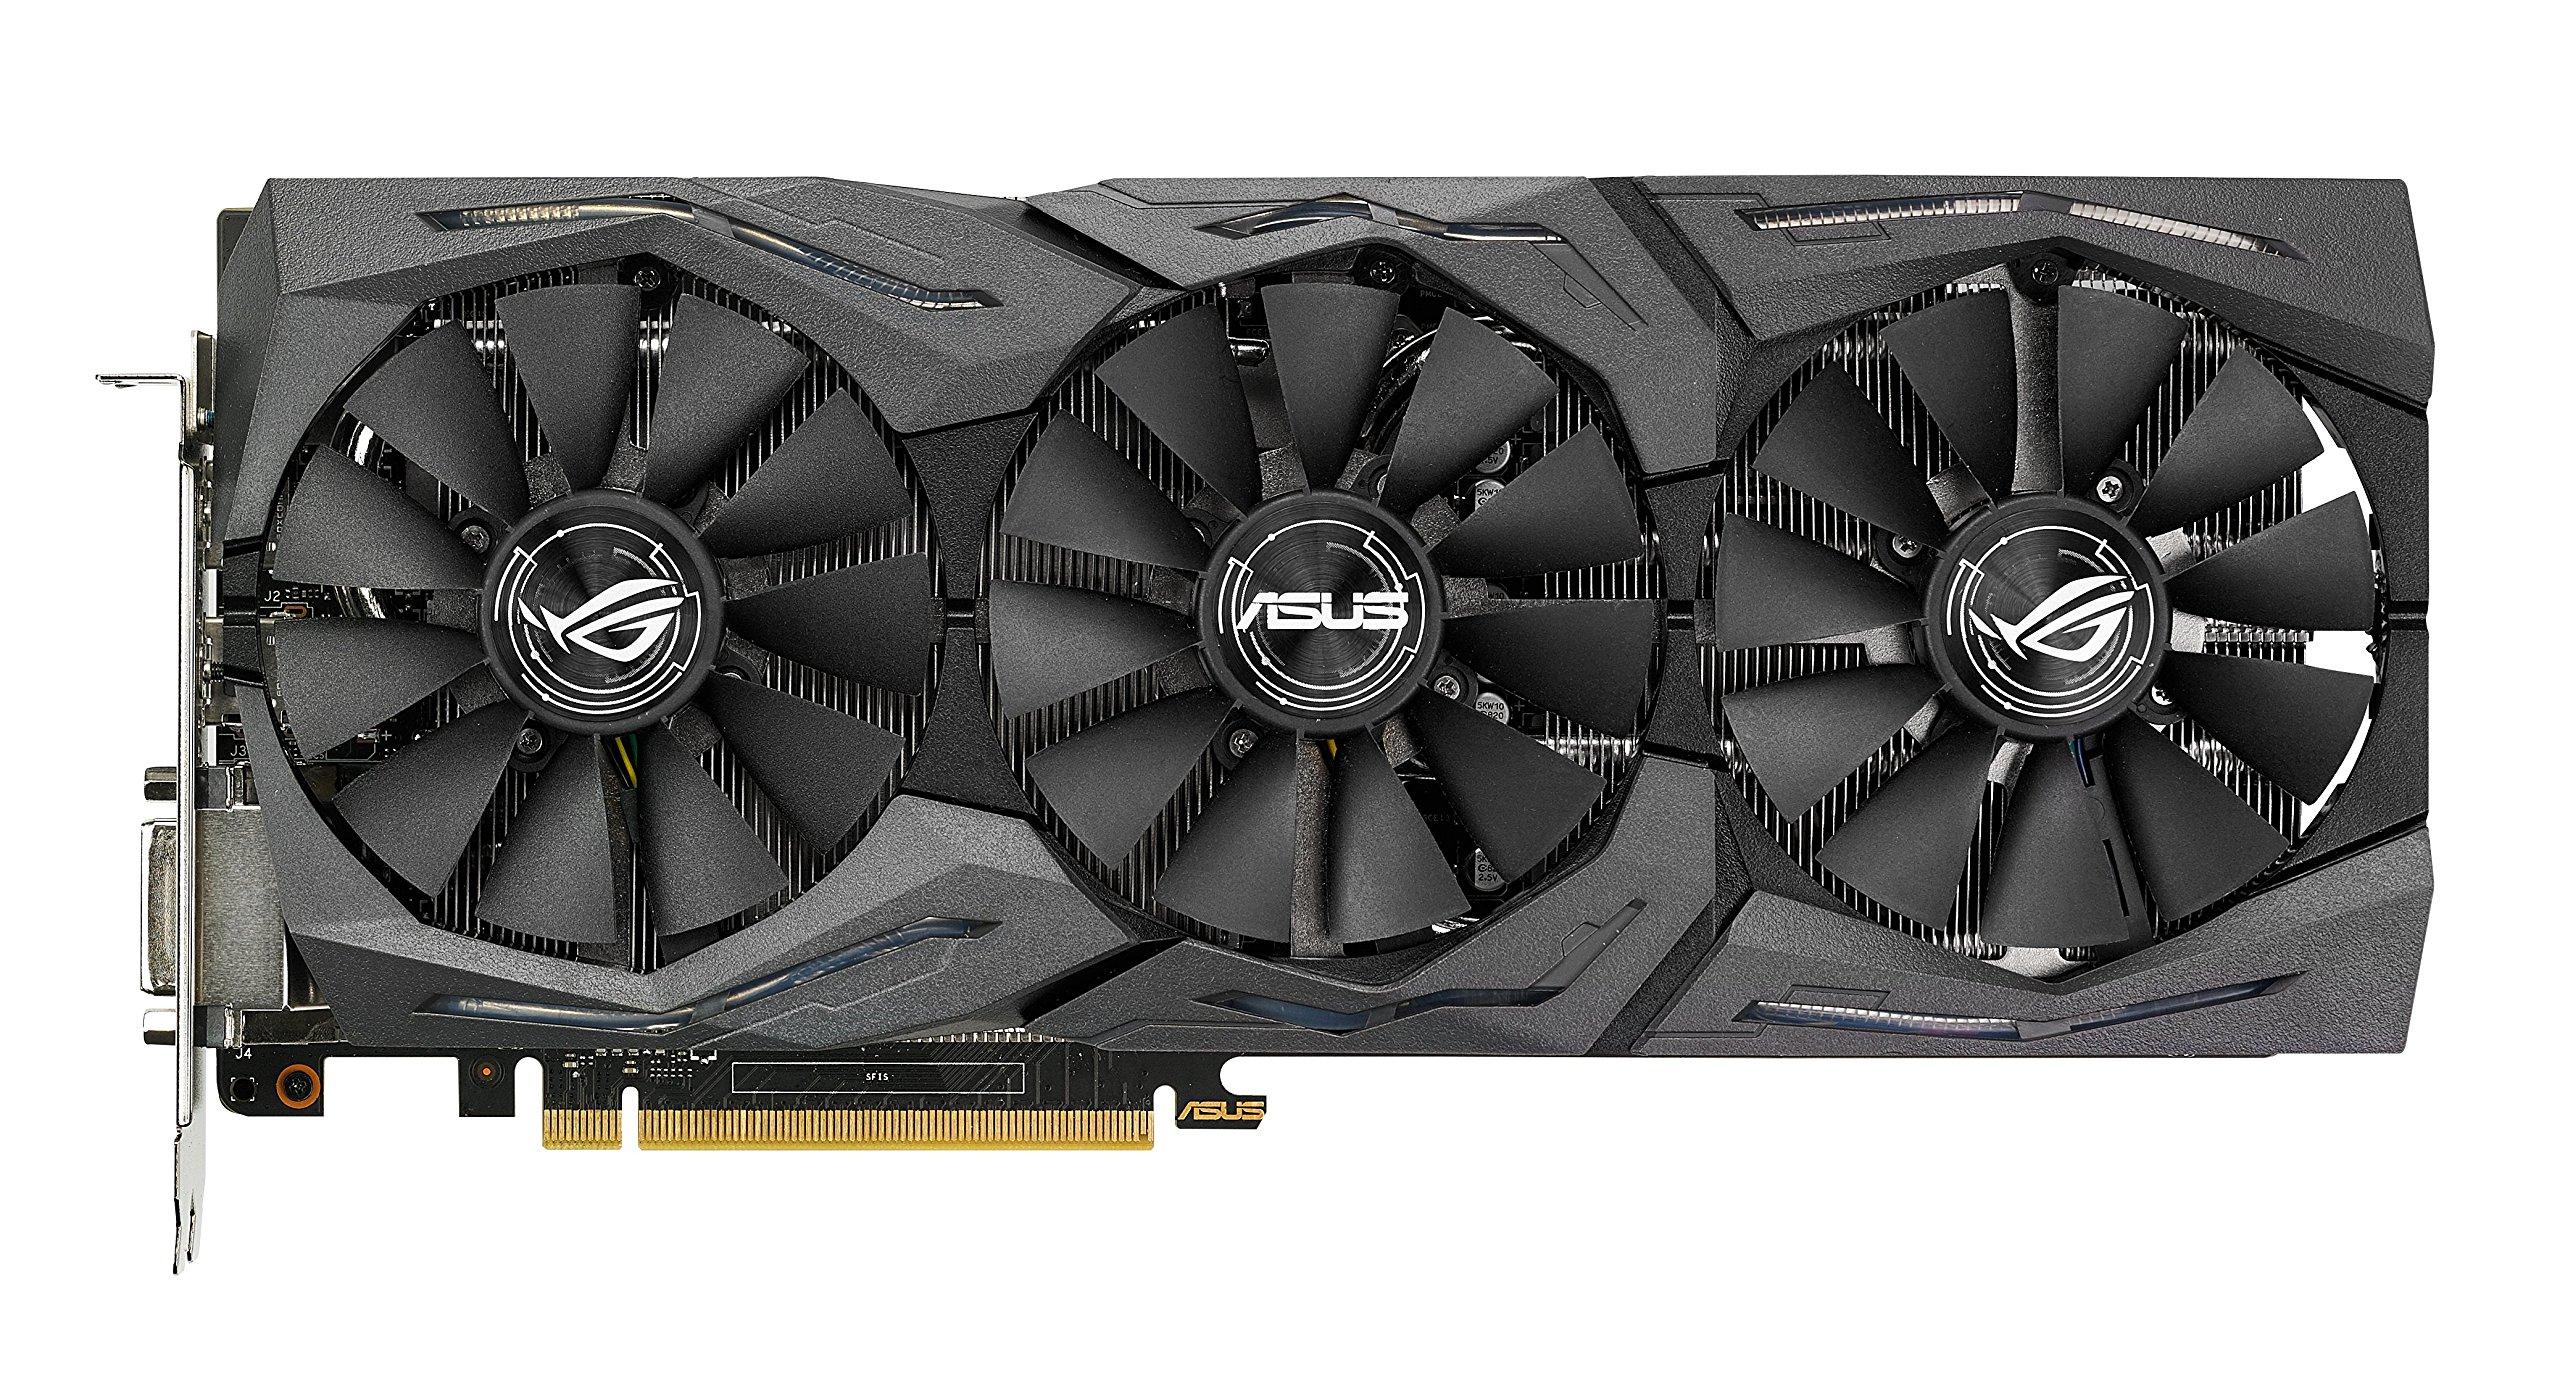 ASUS GeForce GTX 1070 8GB ROG STRIX OC Edition Graphic Card STRIX-GTX1070-O8G-GAMING by Asus (Image #2)